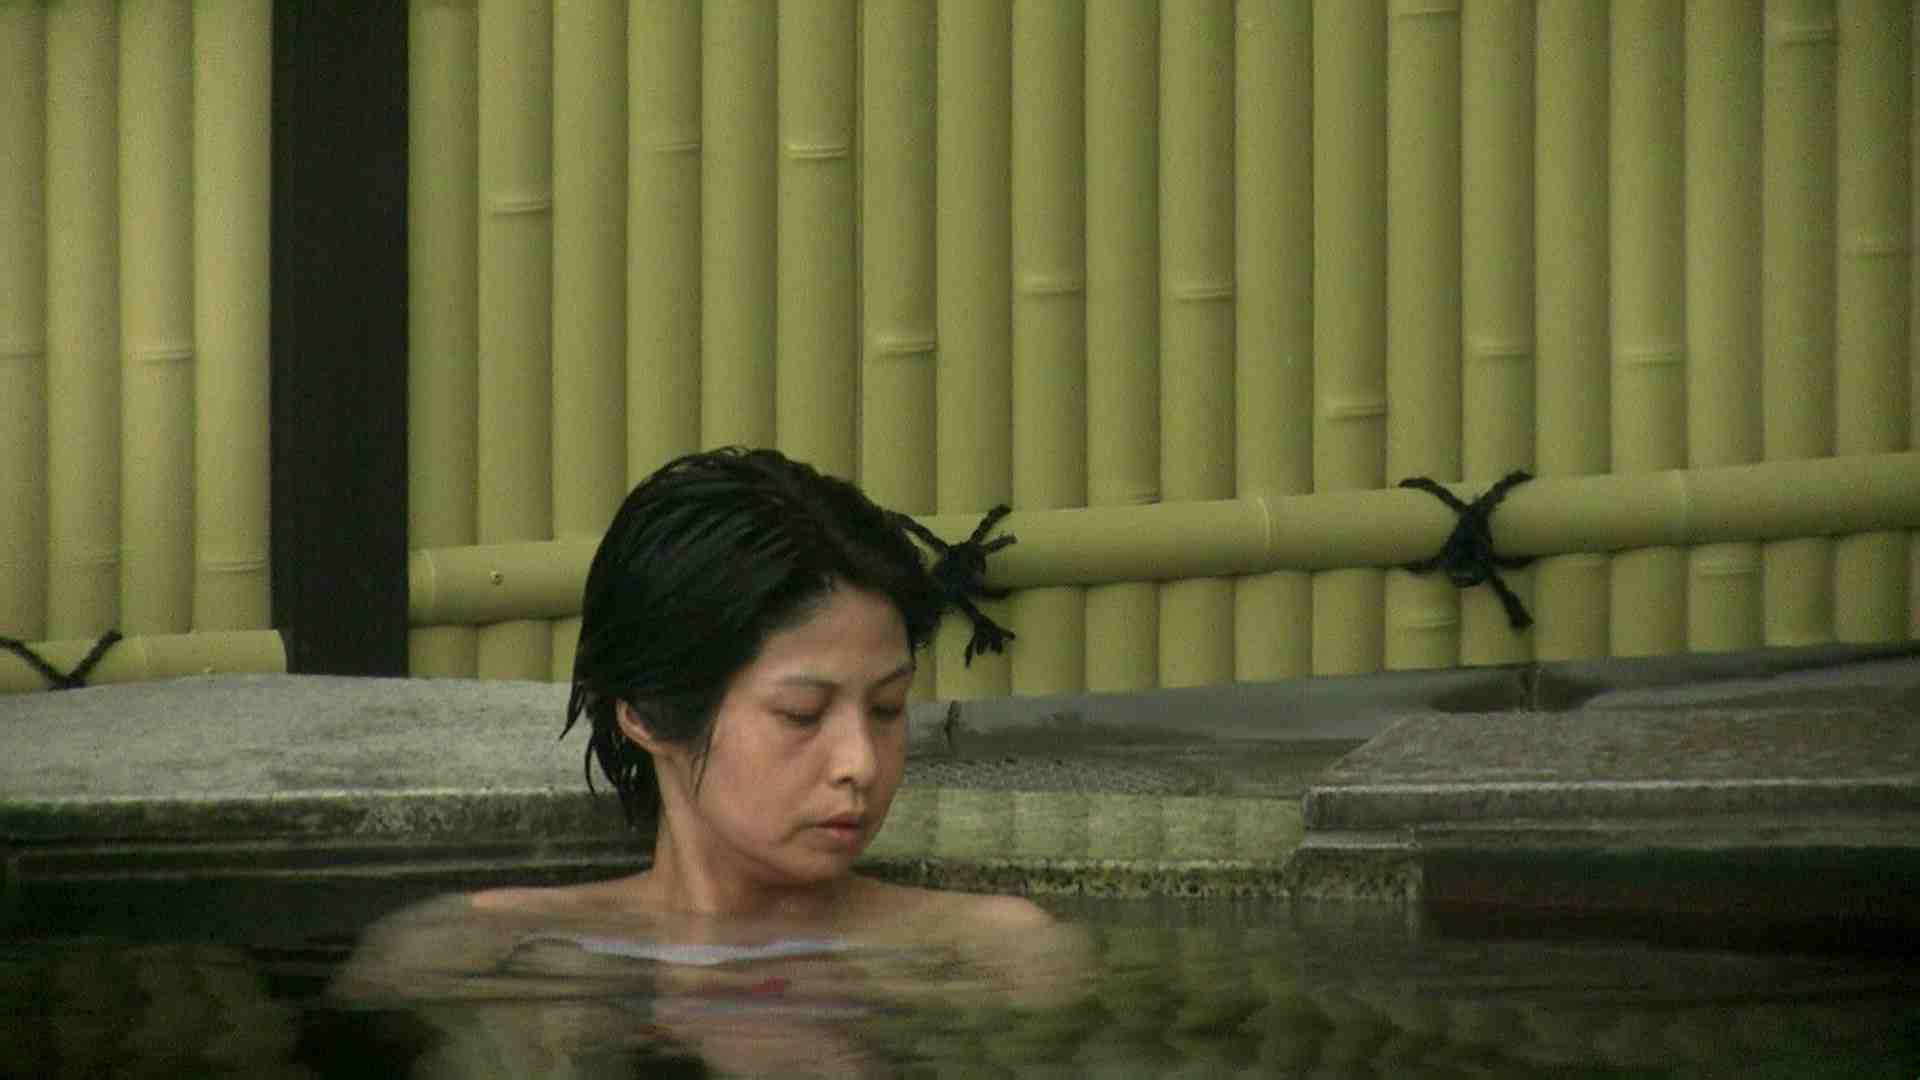 Aquaな露天風呂Vol.636 OL女体  87連発 3